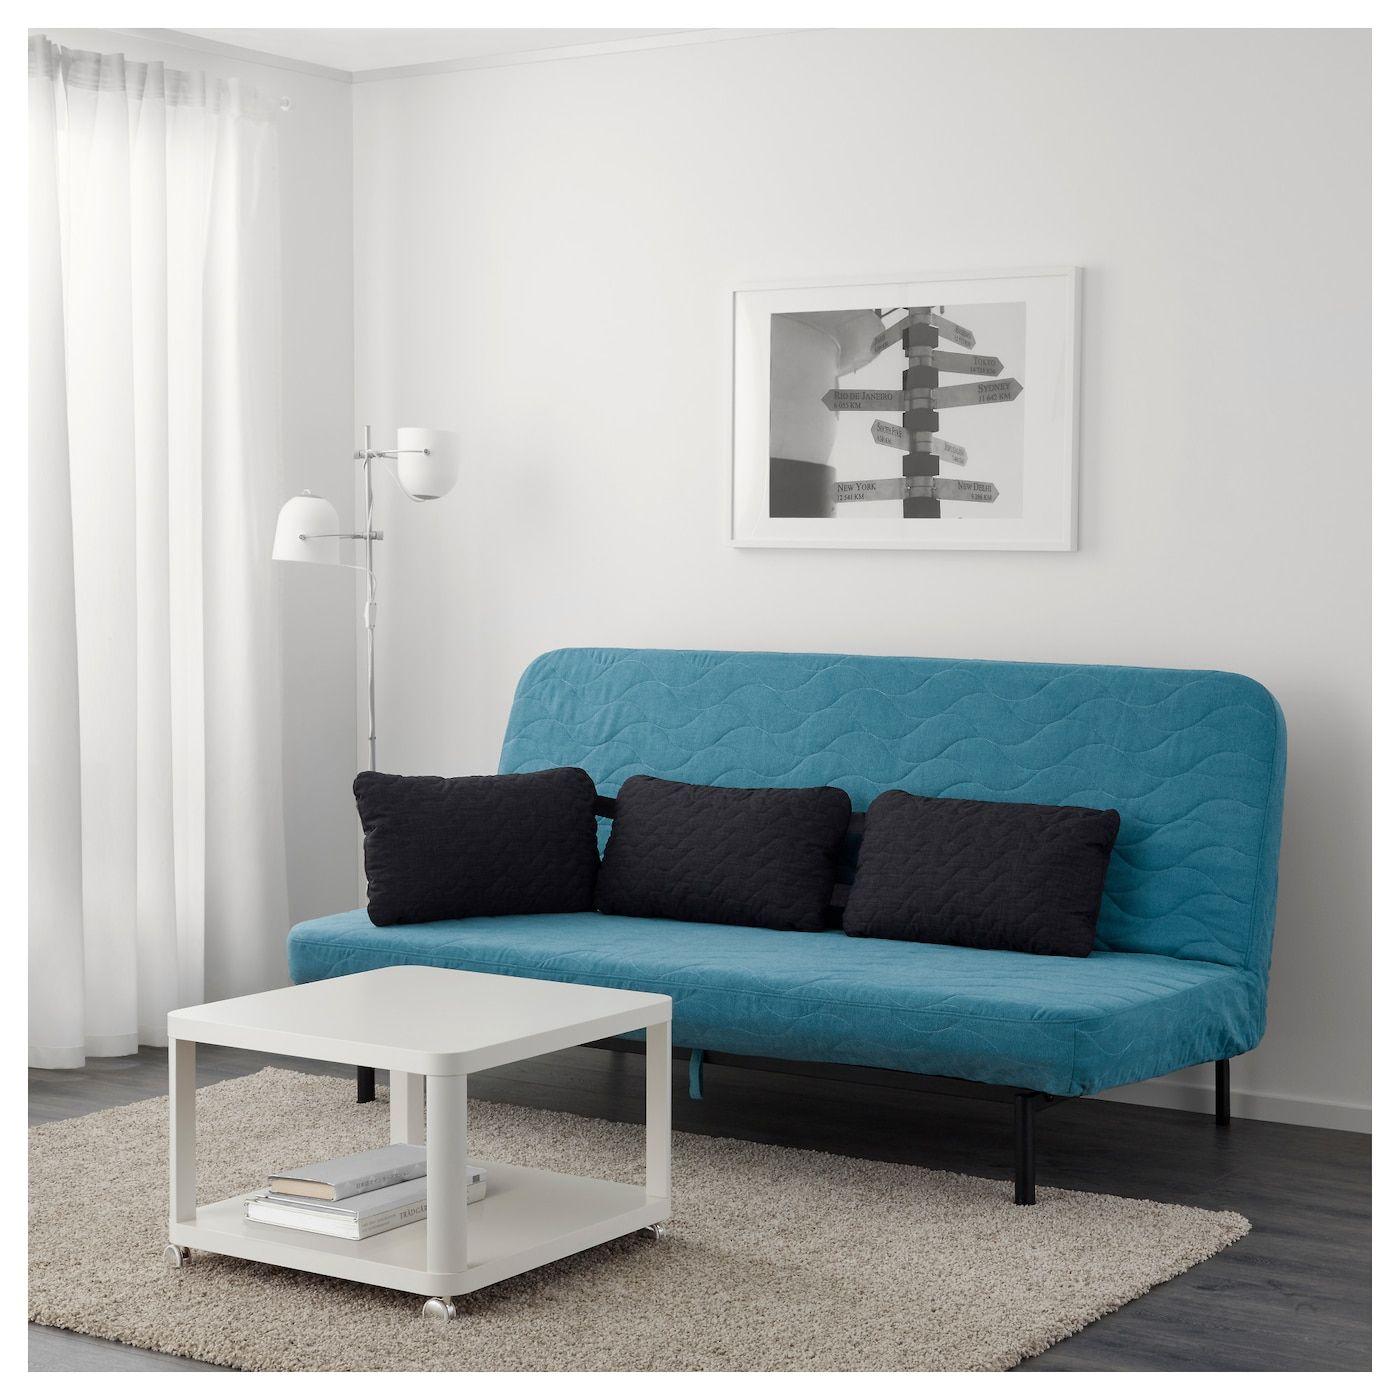 Us Furniture And Home Furnishings In 2019 Ikea Sofa Bed